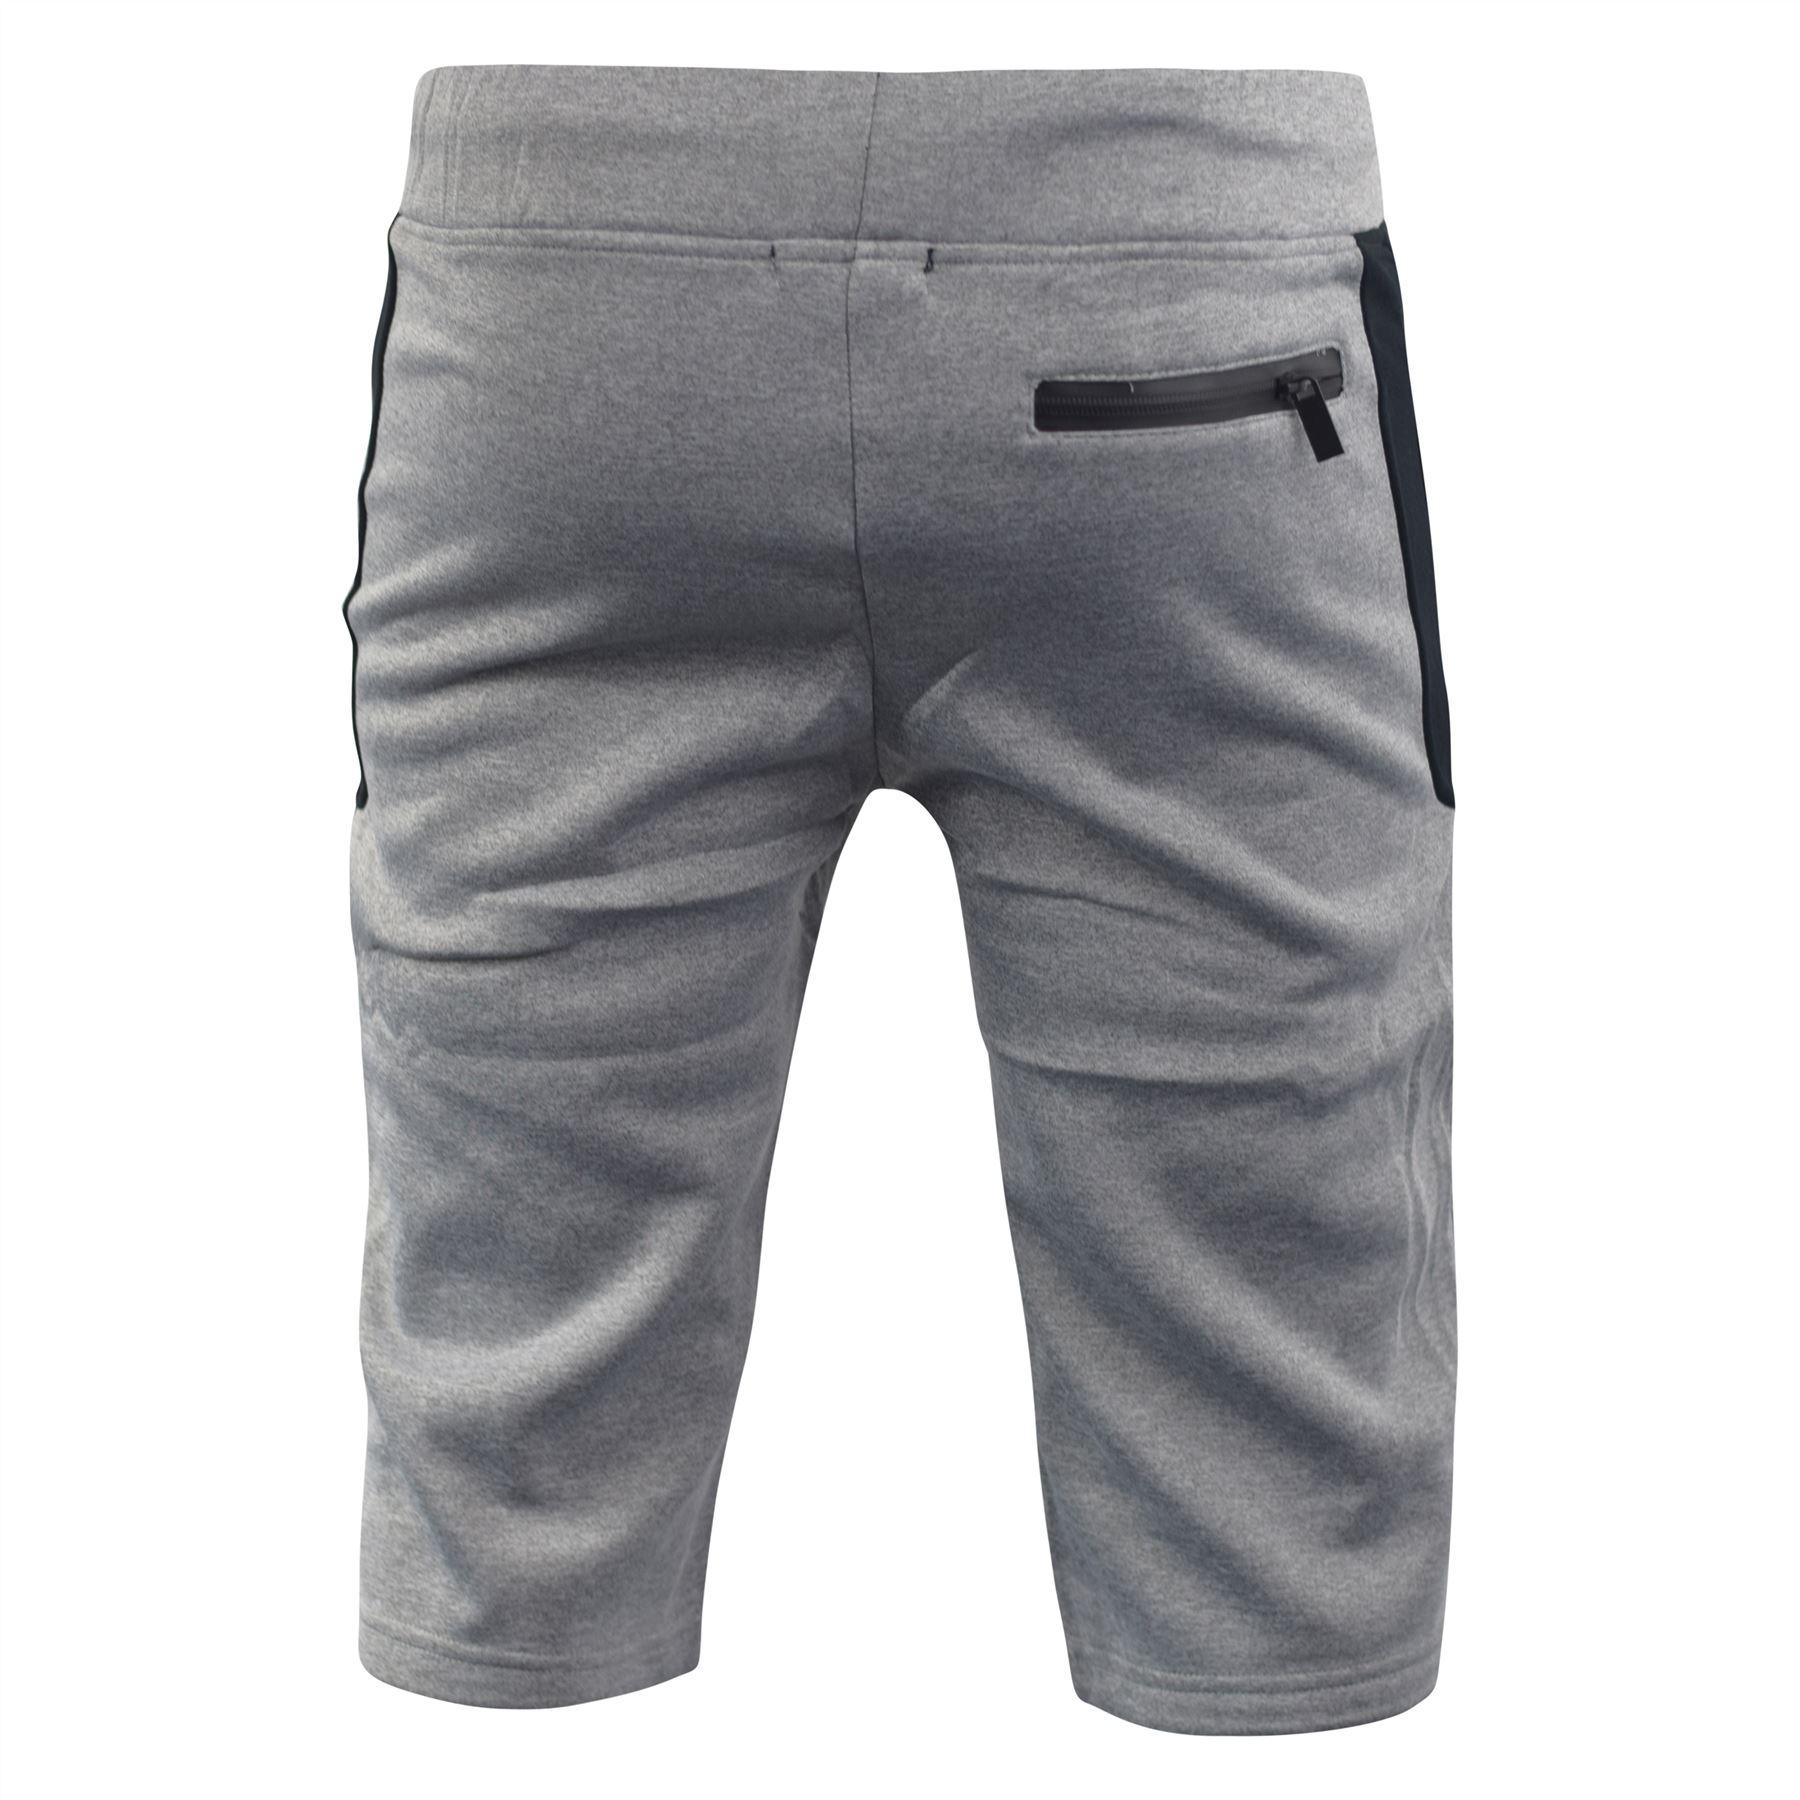 Mens-Jogger-3-4-Shorts-D-Rock-Half-Pants-Sport-Trousers-Casual-Bottom thumbnail 6